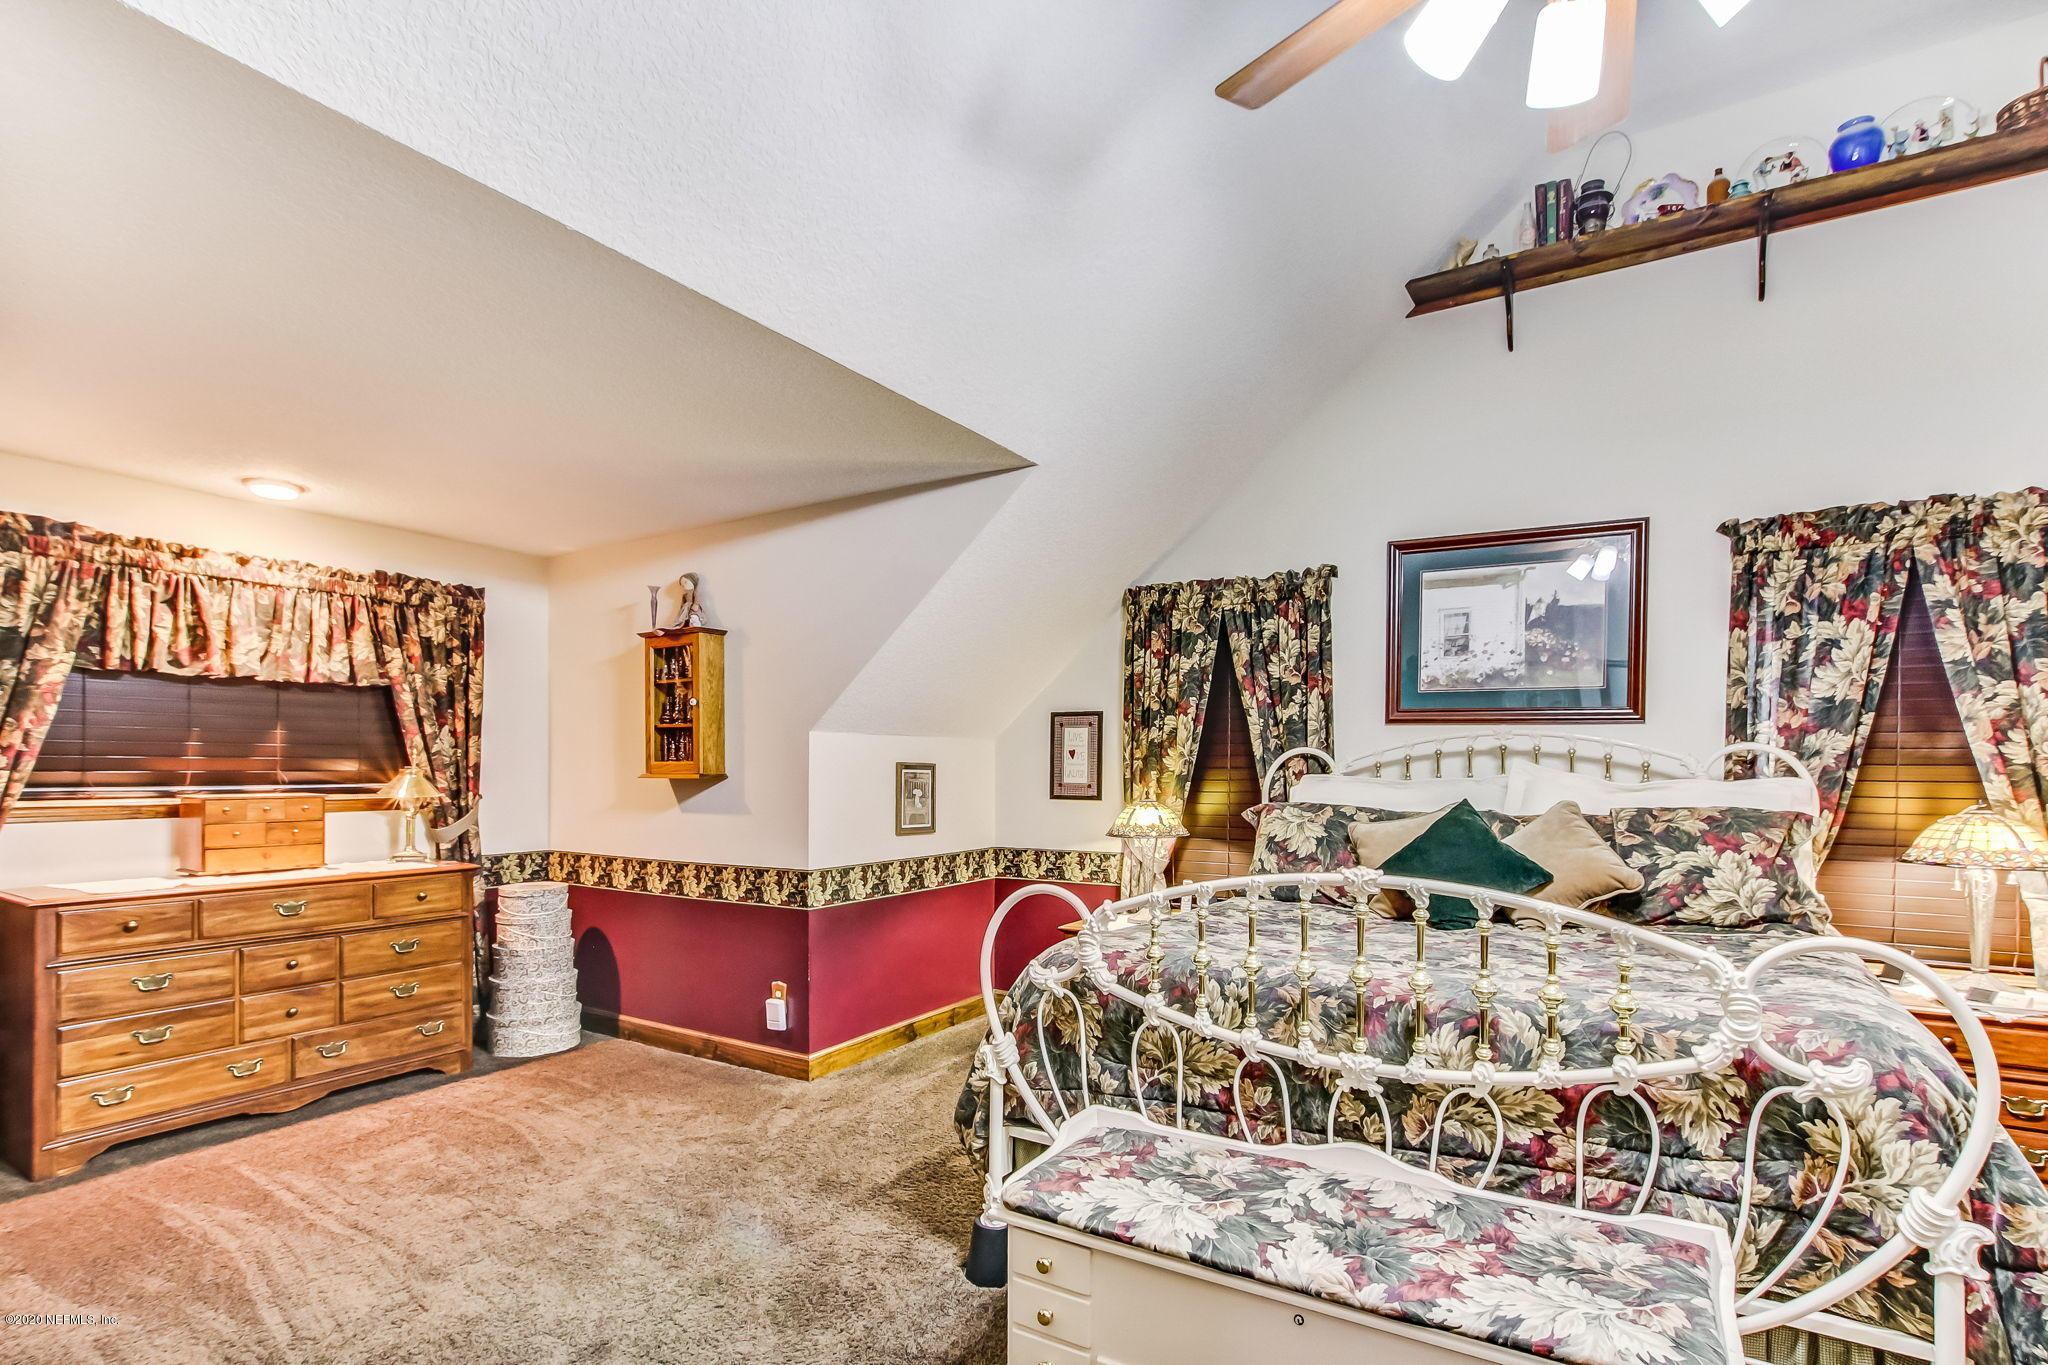 2709 PHEASANT, ST JOHNS, FLORIDA 32259, 5 Bedrooms Bedrooms, ,3 BathroomsBathrooms,Residential,For sale,PHEASANT,1081625